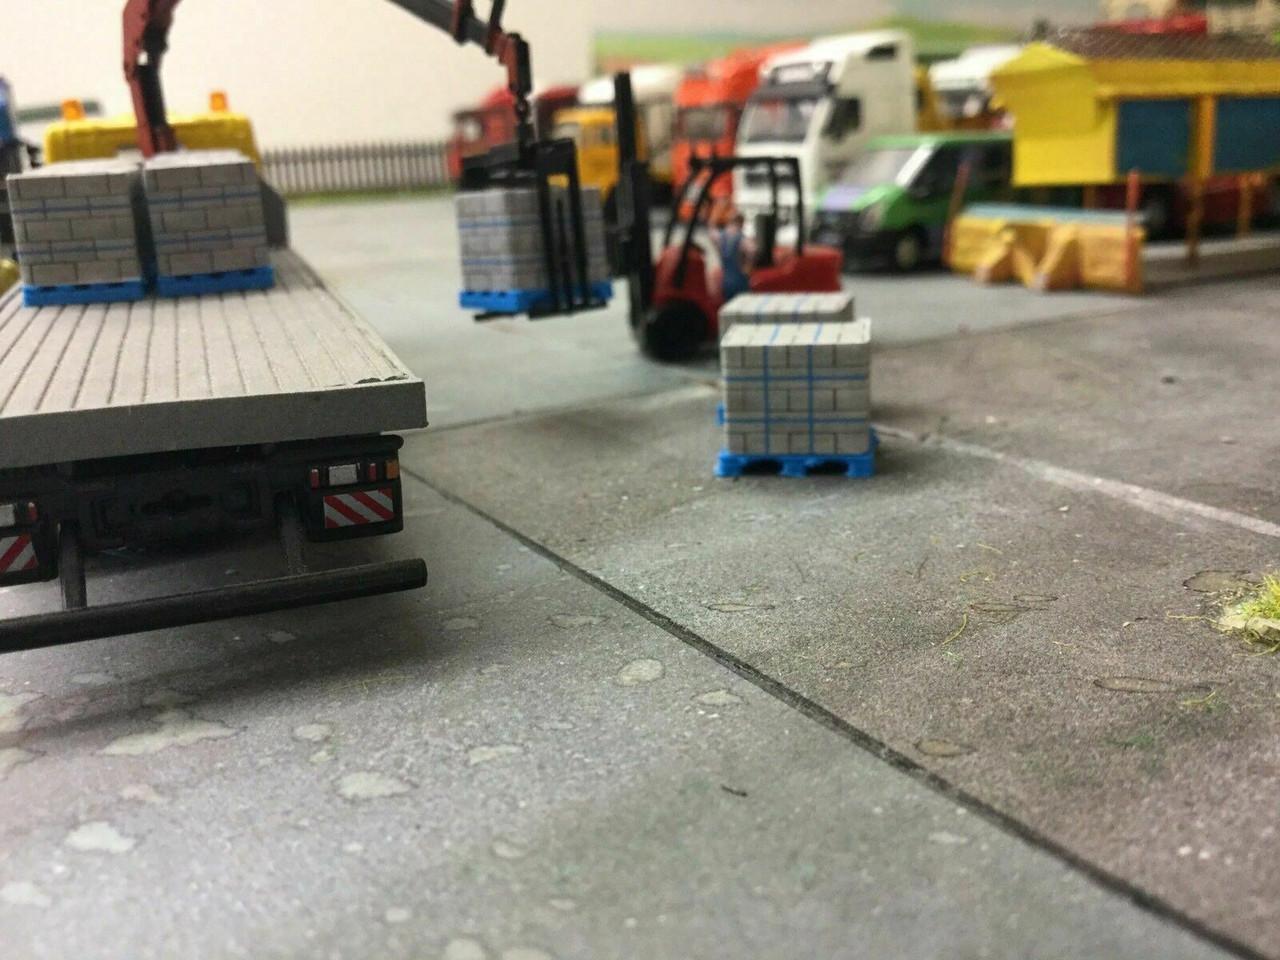 1:76 3D Printed Concrete Block Pallet with Load - 10pk